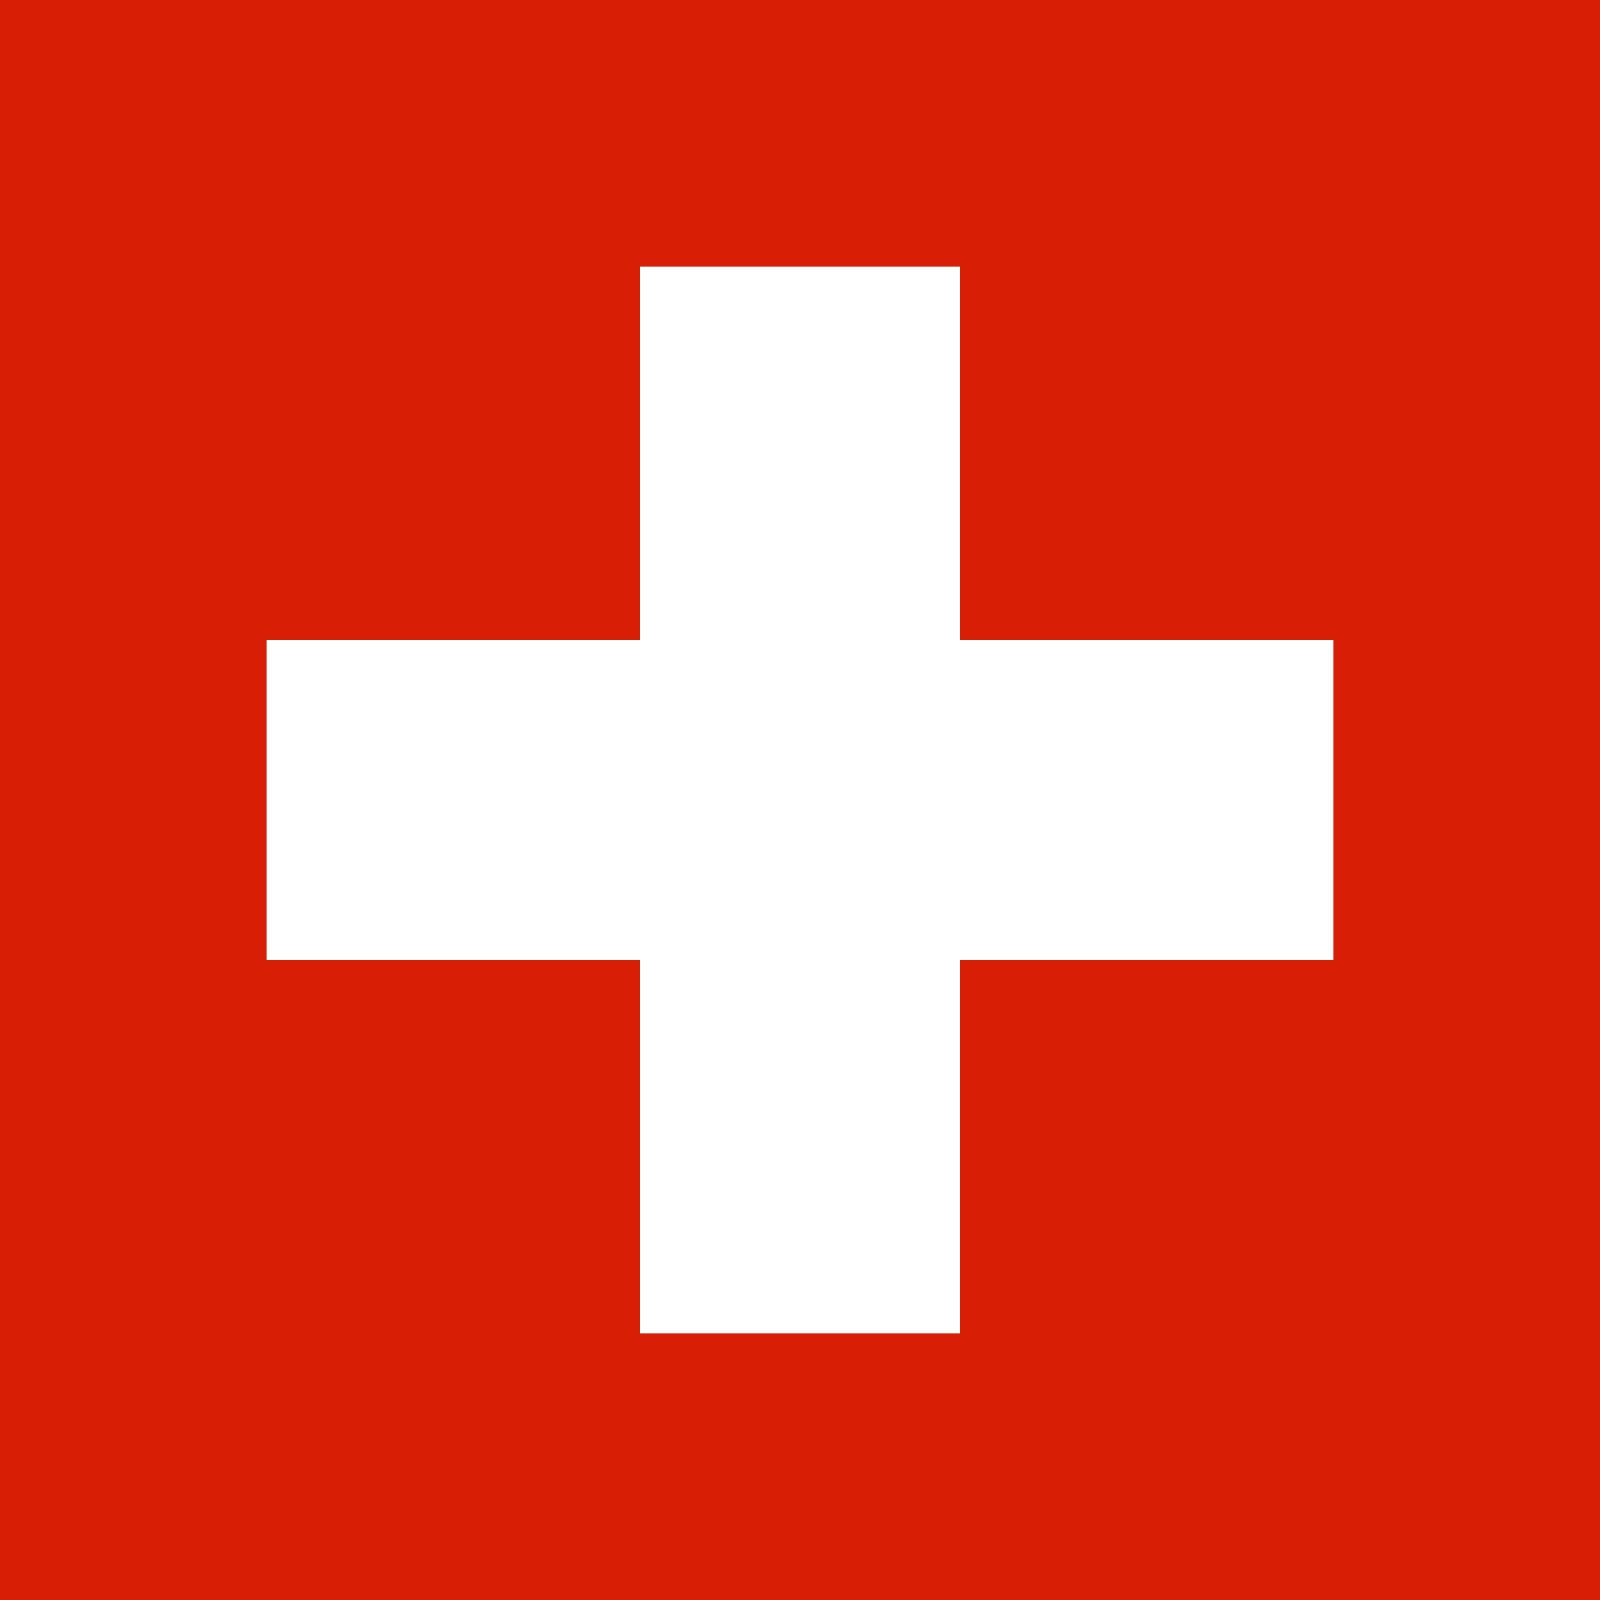 Agence rencontre suisse romande